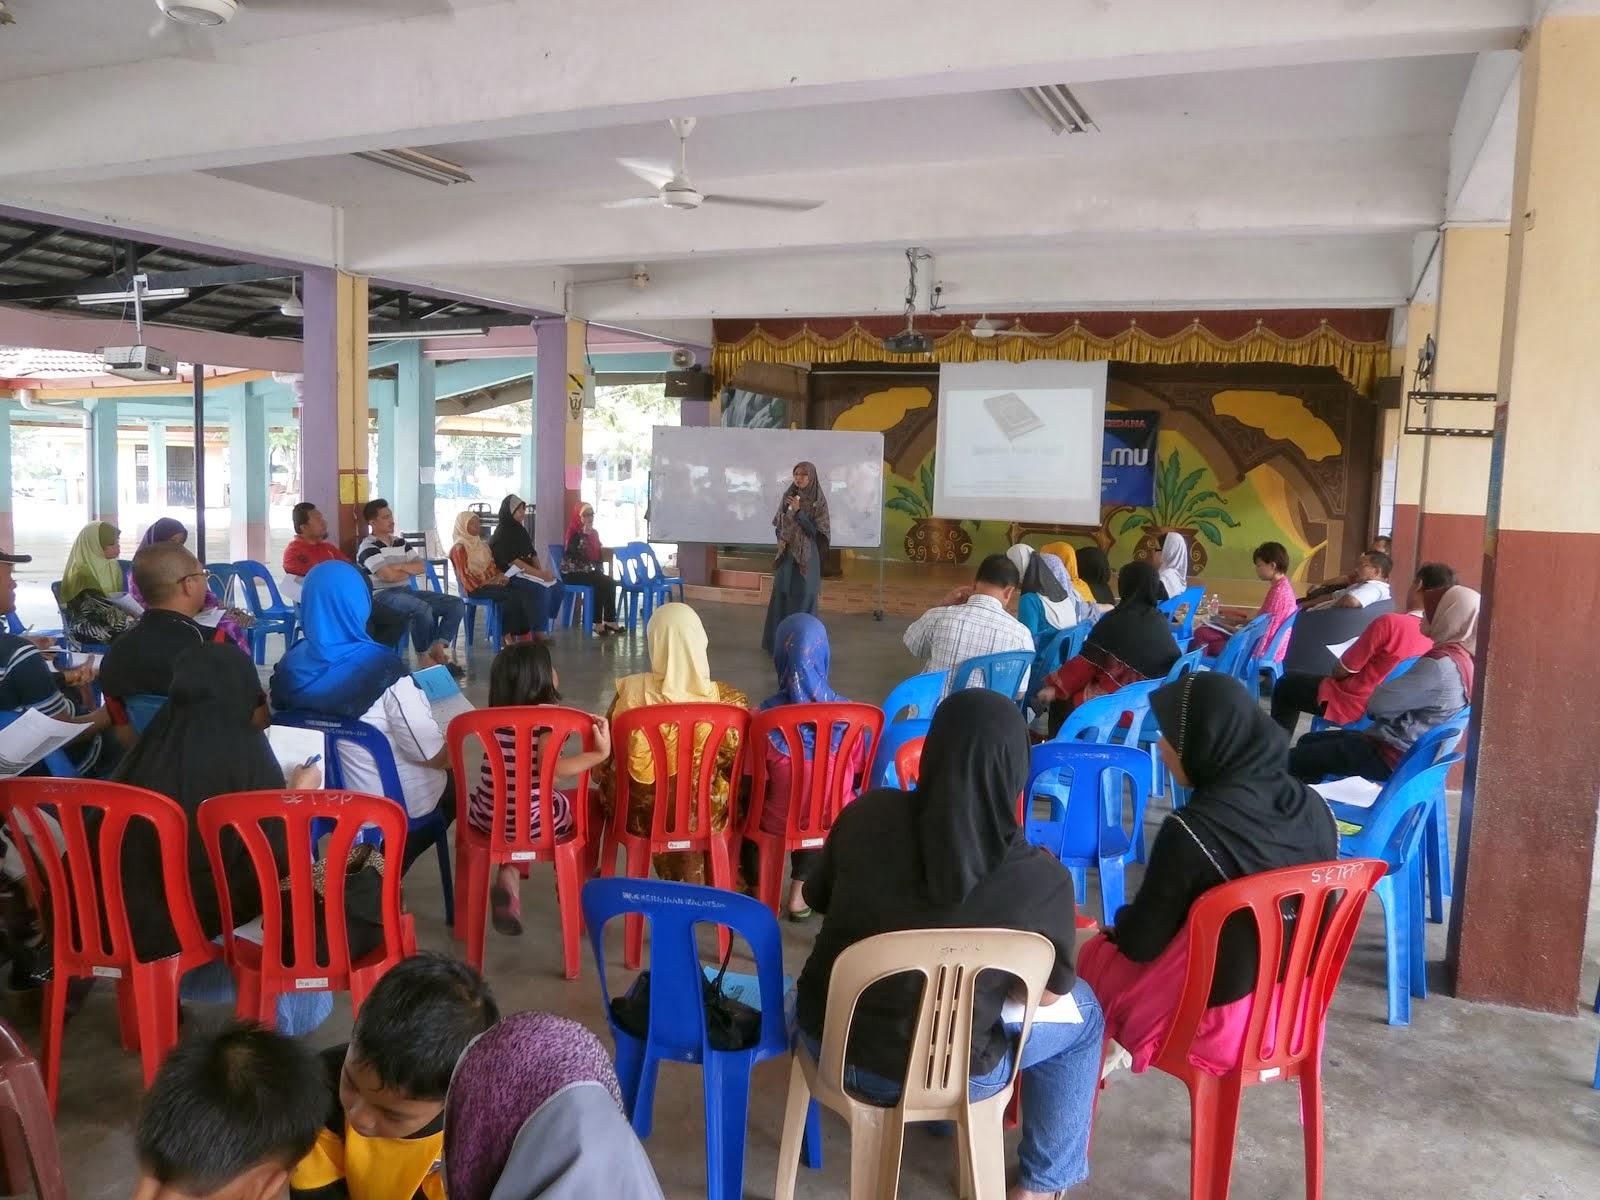 Seminar Mendorong Anak di SK Putra Perdana